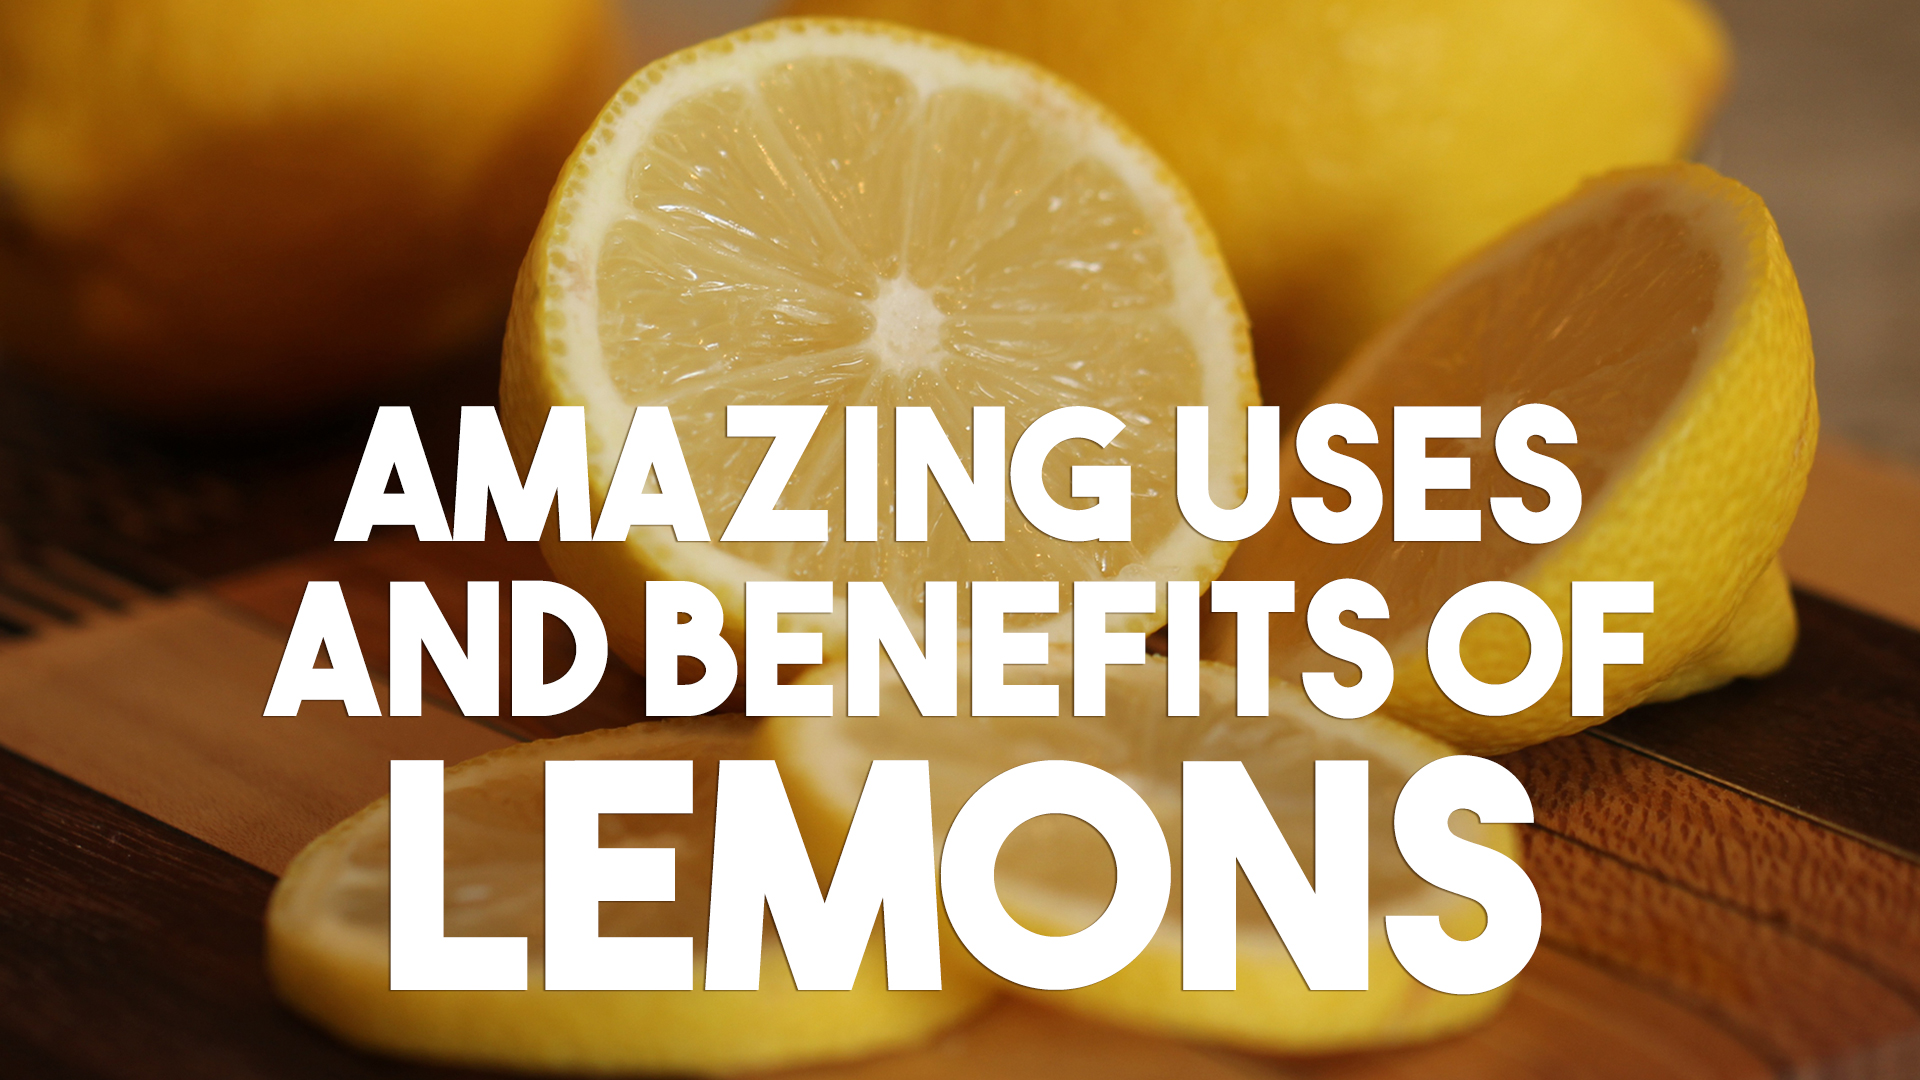 Amazing Uses And Benefits Of Lemons